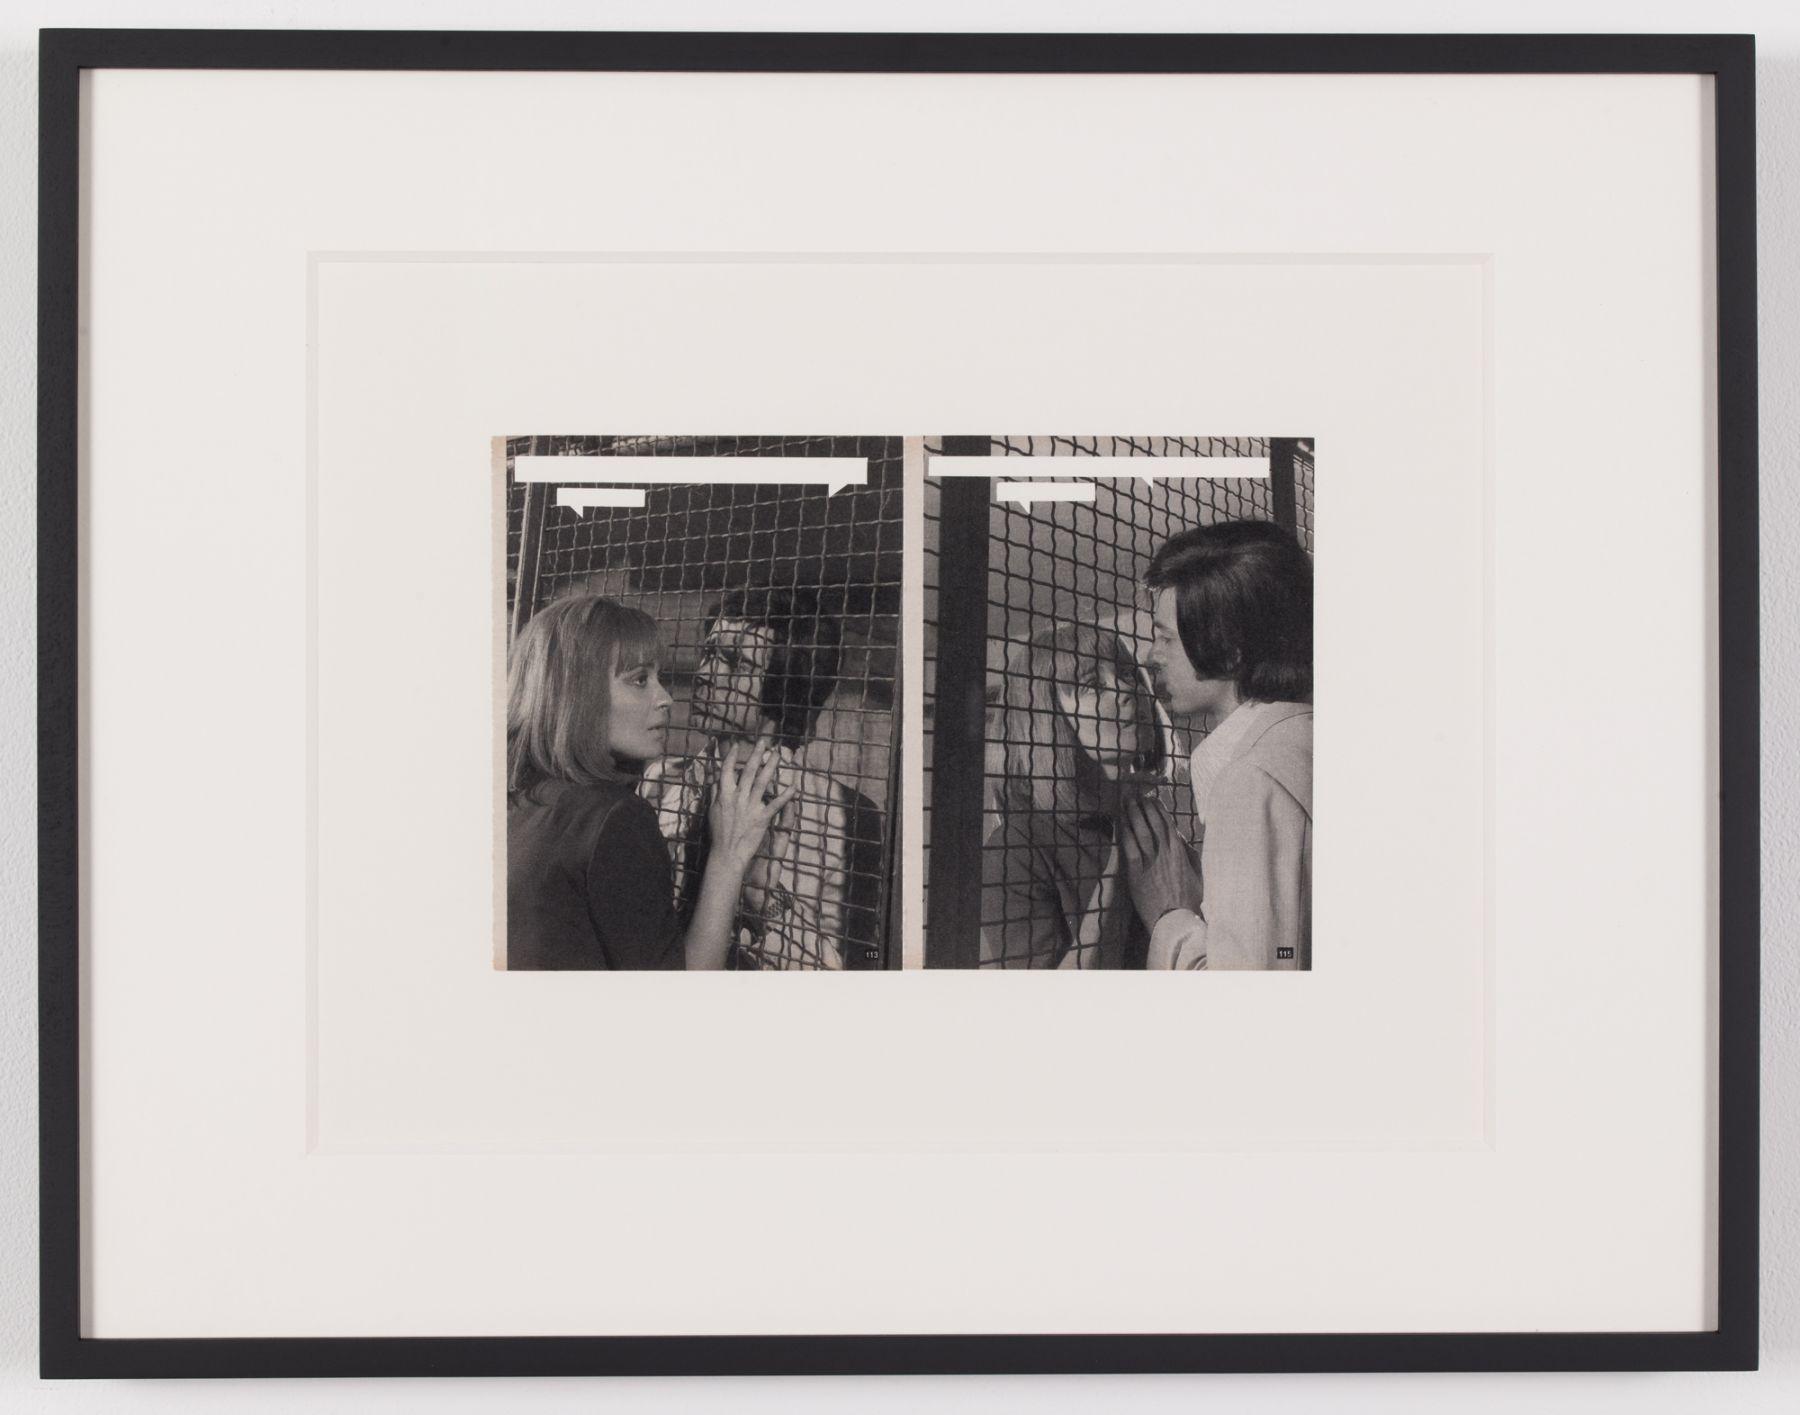 John Stezaker, Touch I (Photoroman)